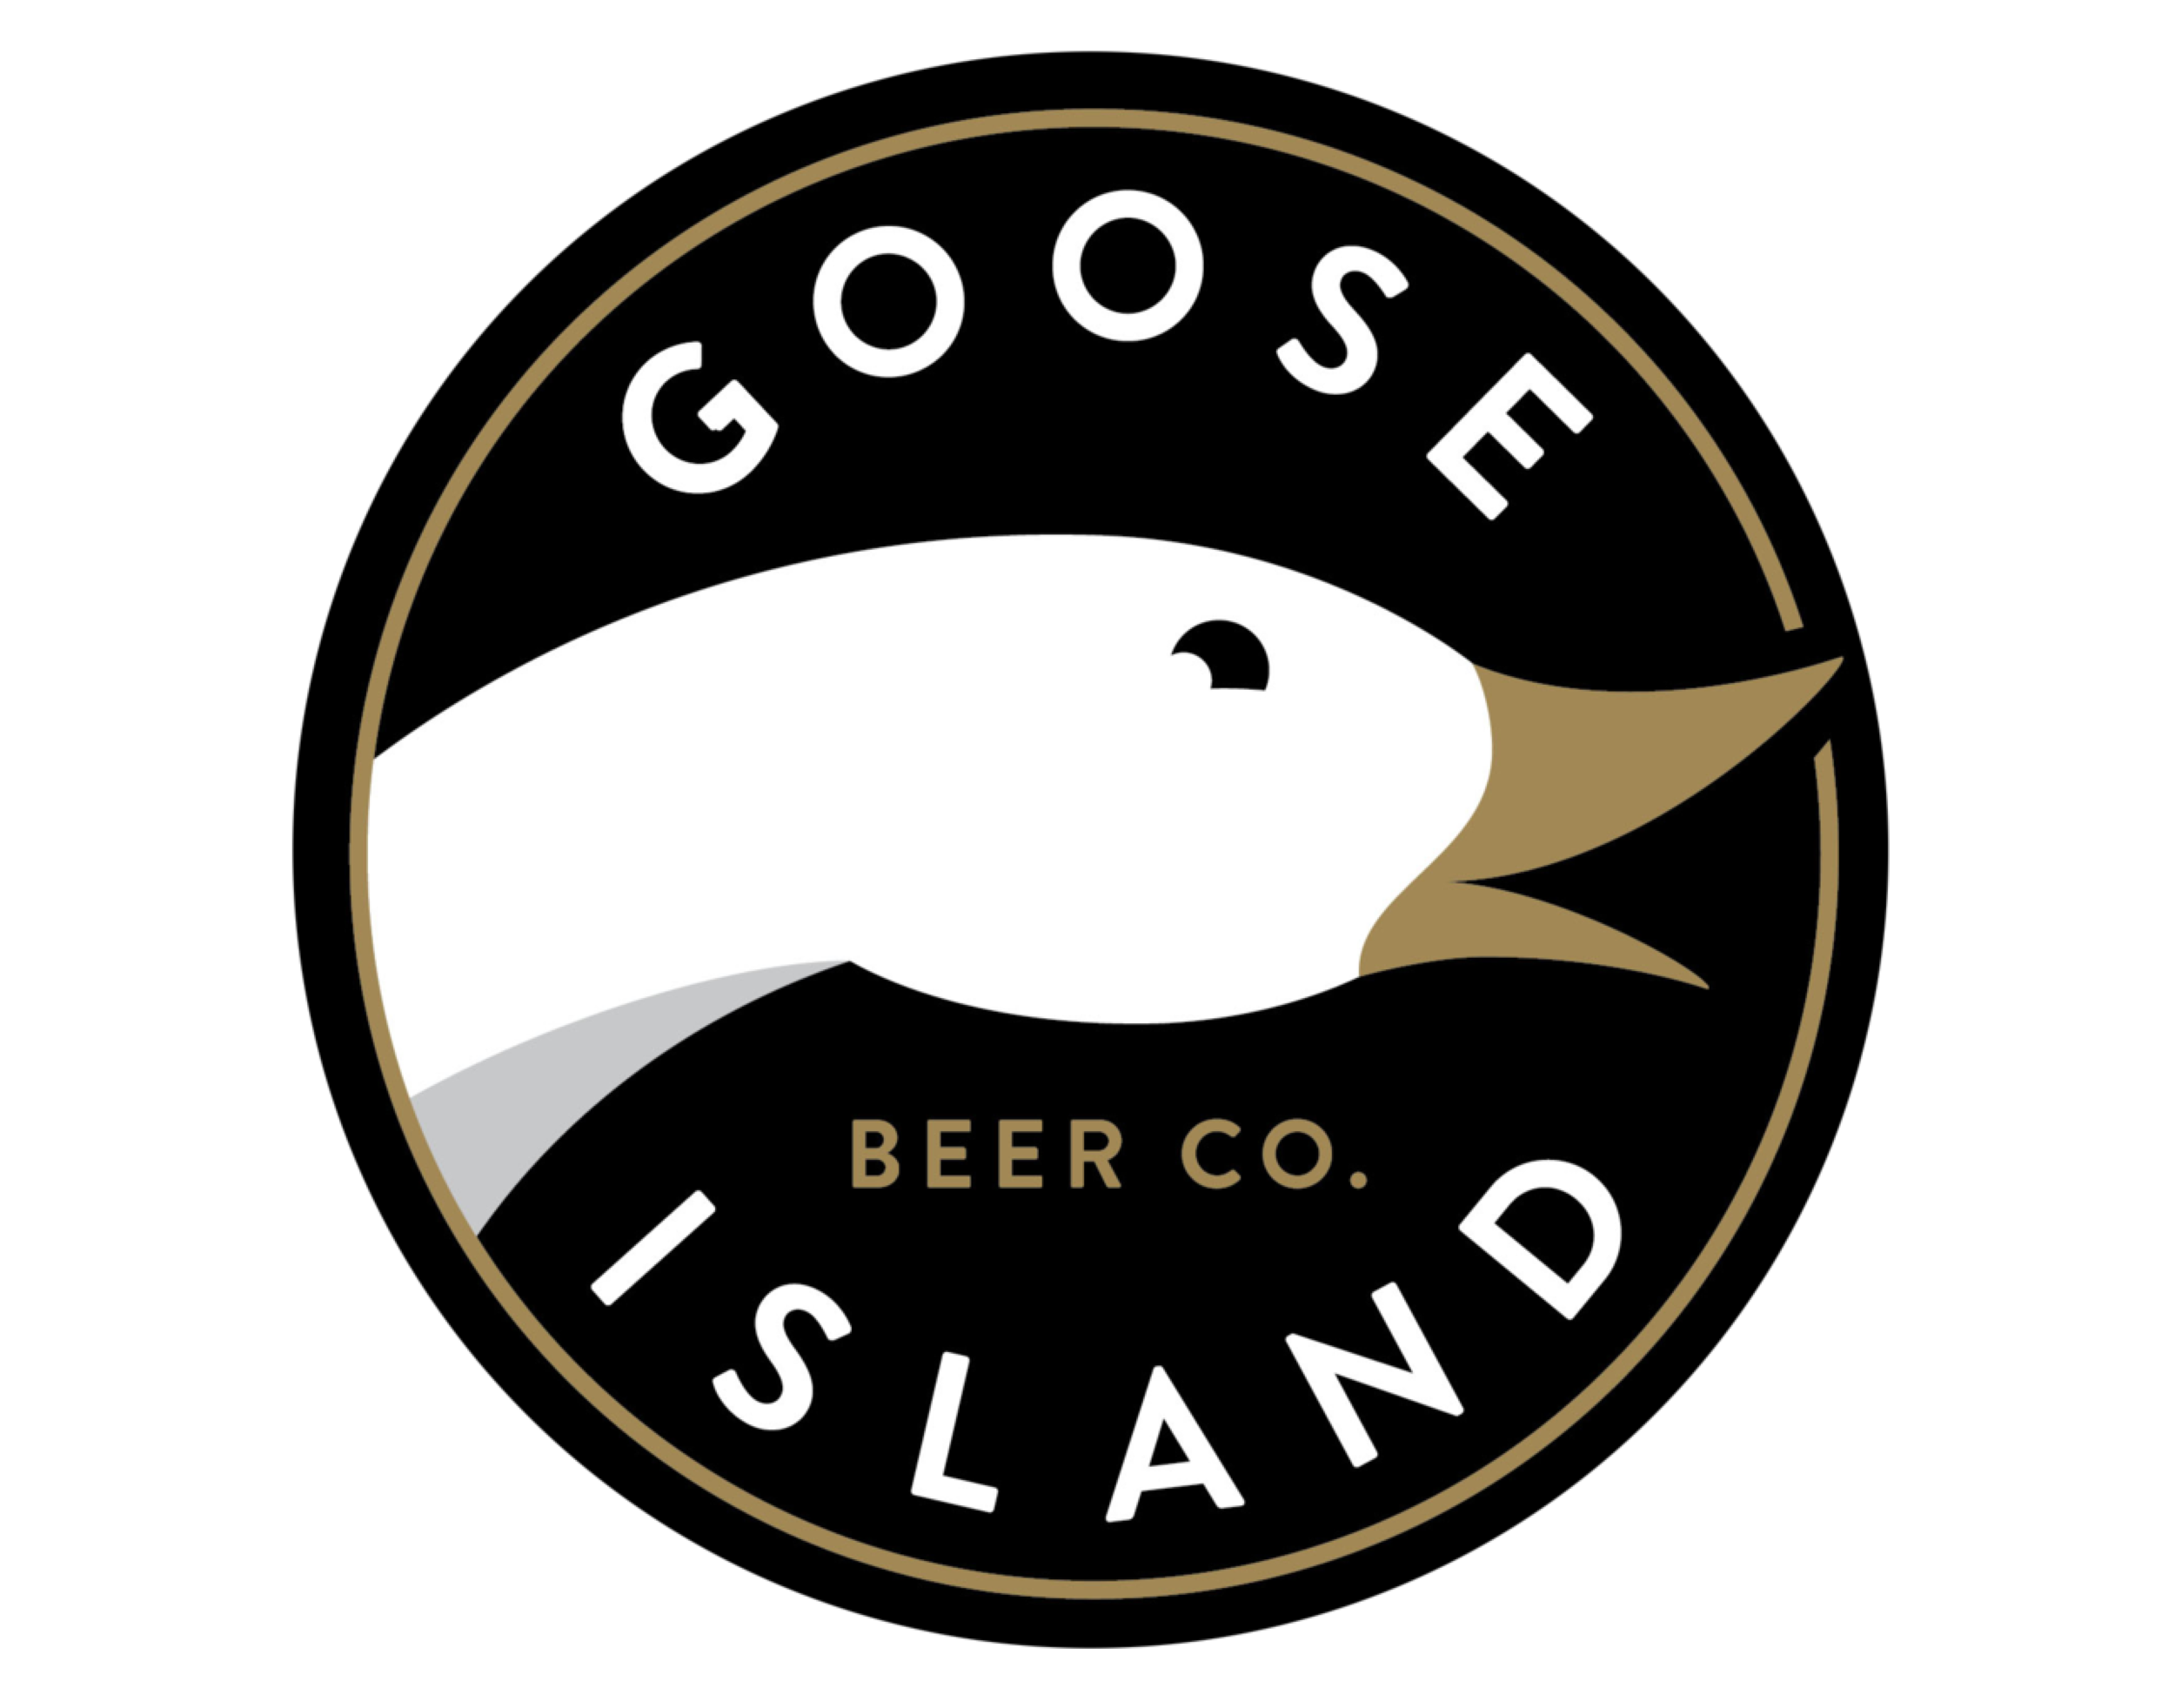 Goose Island logo. Links to Goose Island website.